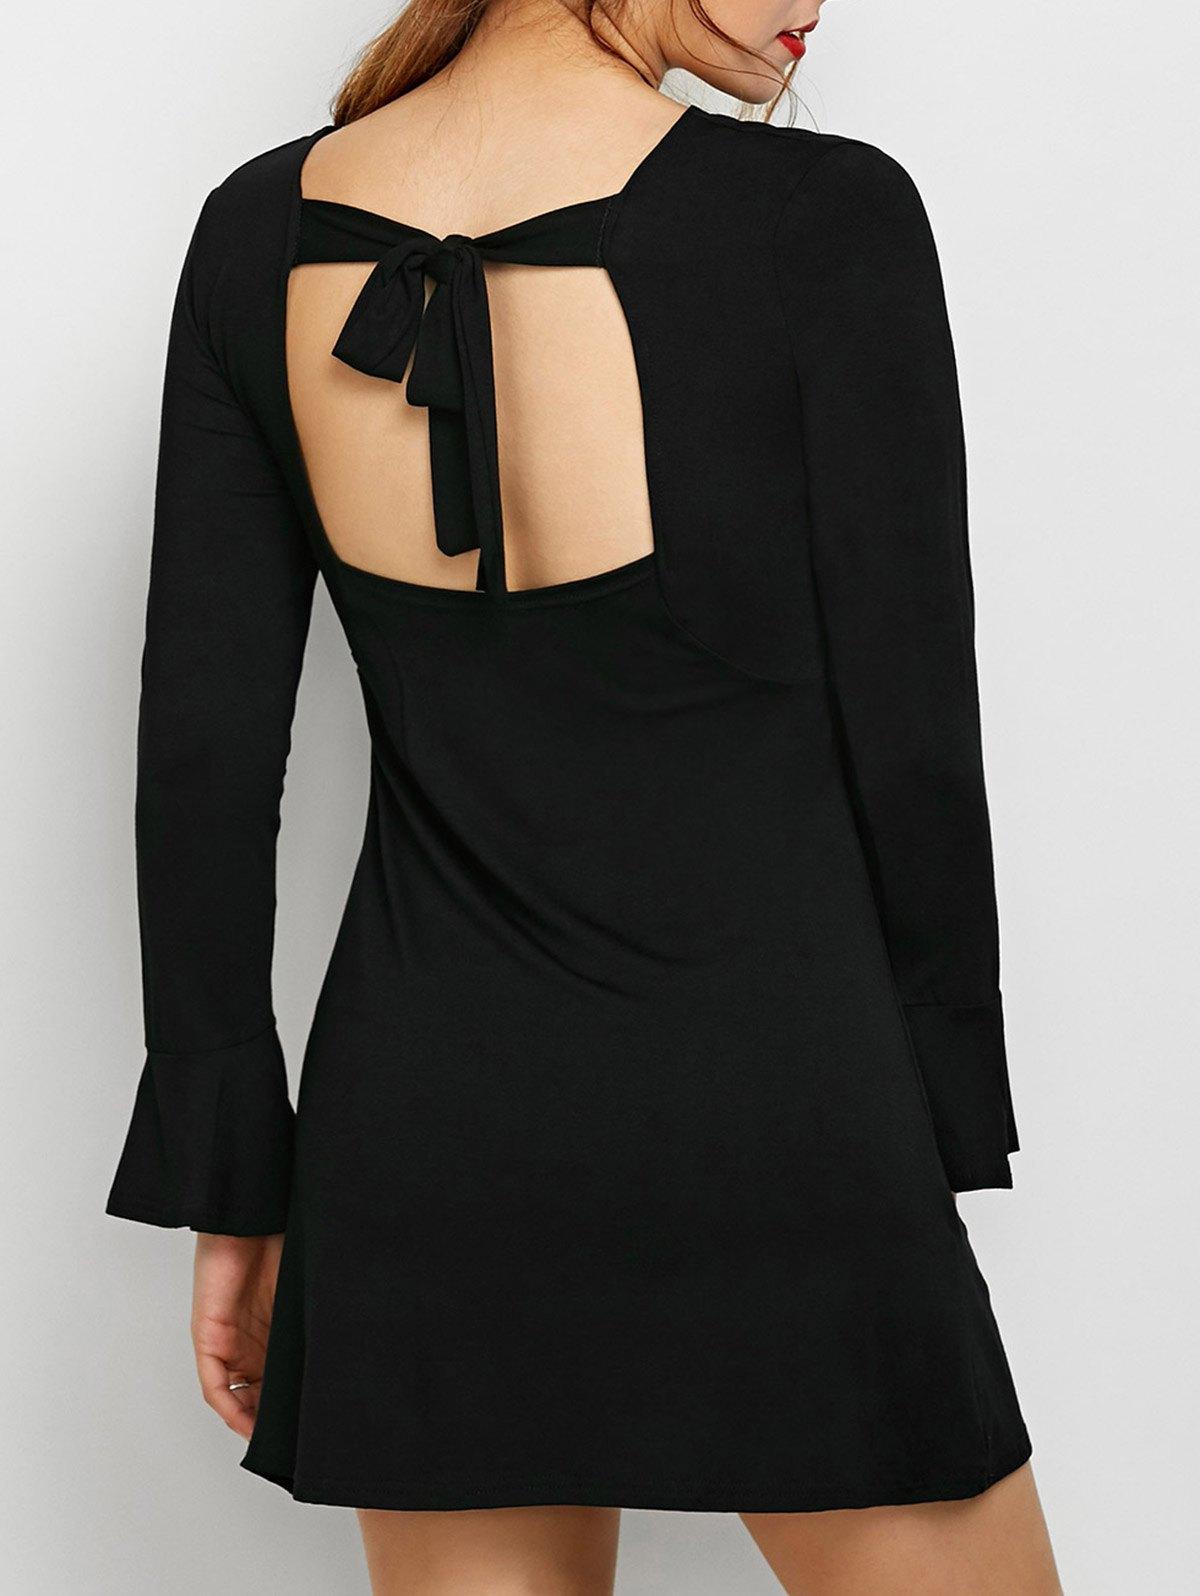 Flare Sleeve Cut Out DressClothes<br><br><br>Size: S<br>Color: BLACK